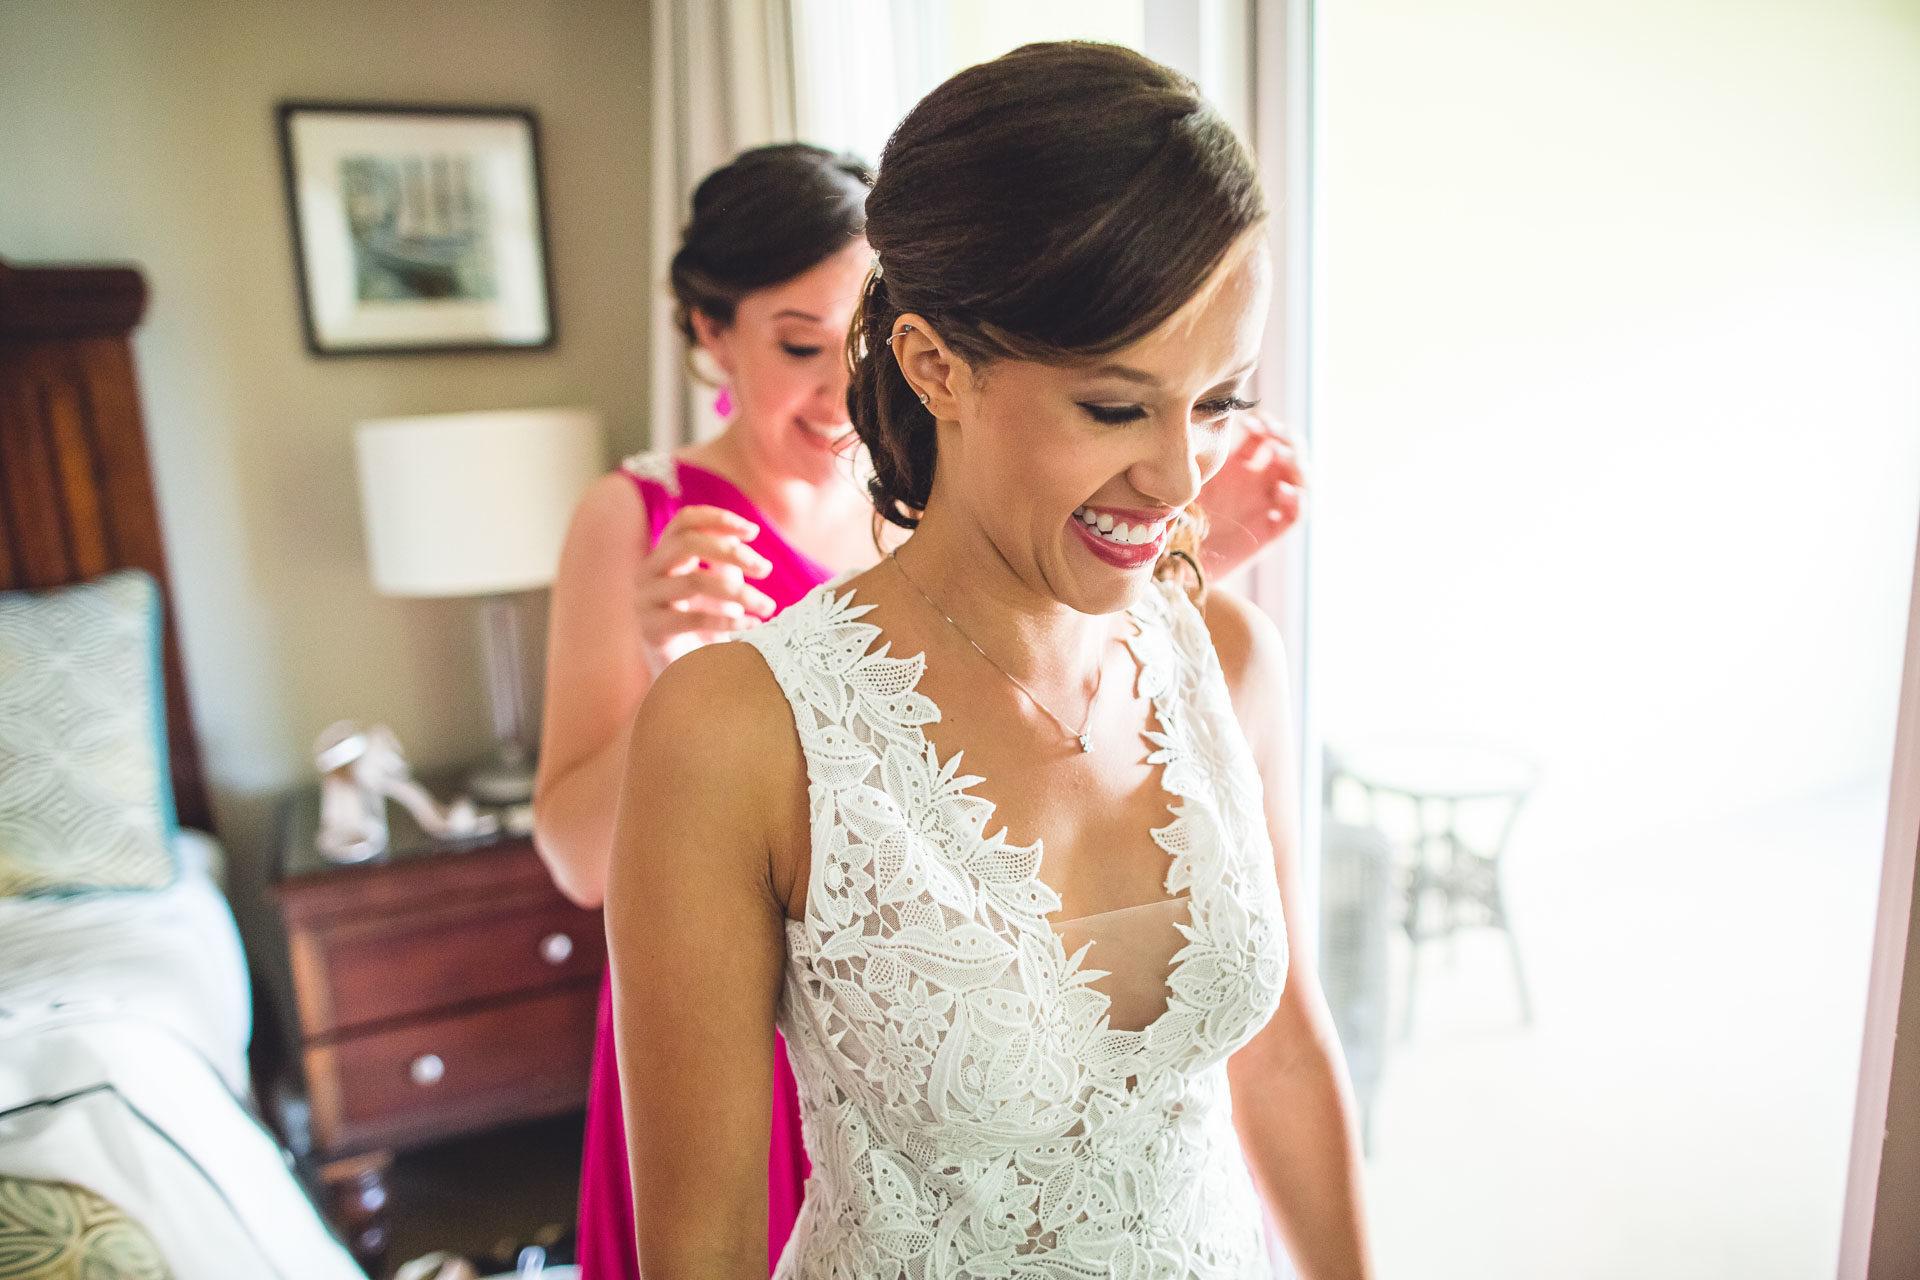 Lead Photographer James Riley Second Rachel Venue Wild Dunes Resort Coordination JW Weddings Florist